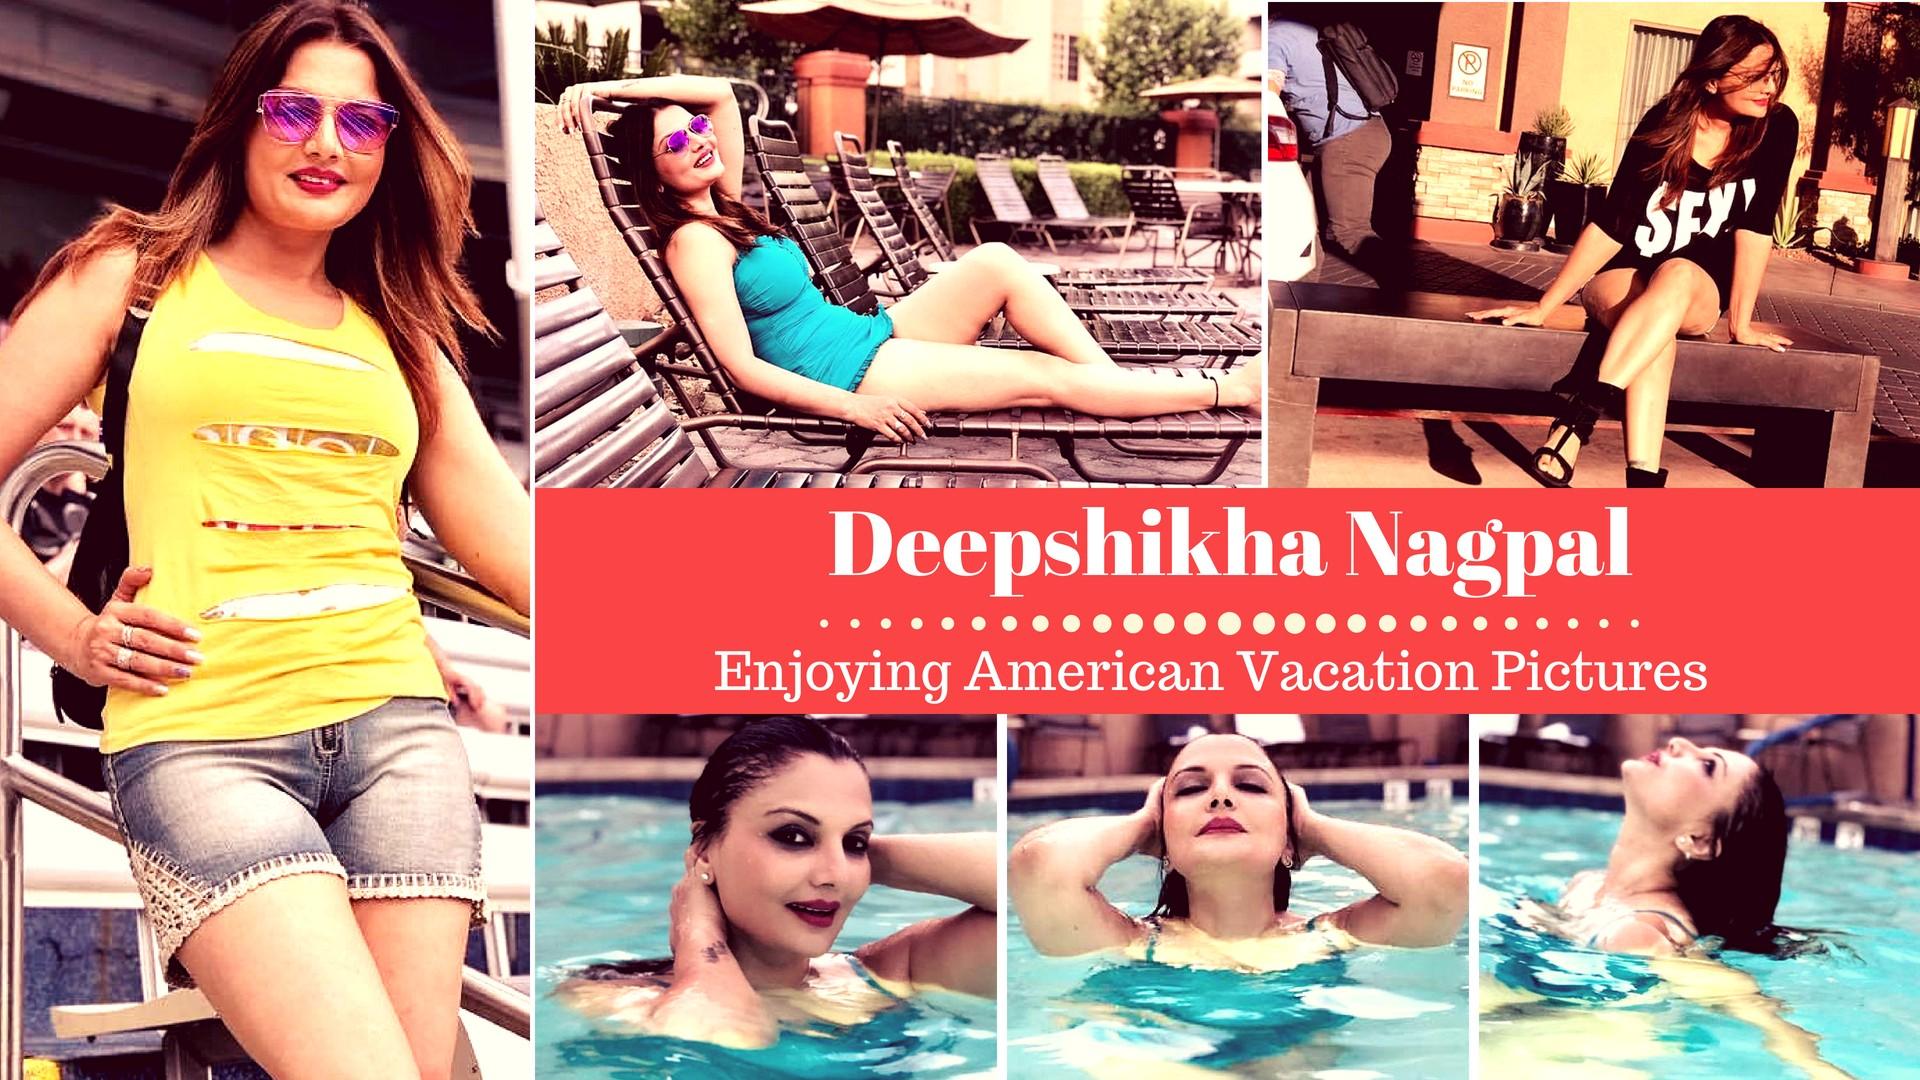 Sexy Deepshikha Nagpal Picture Collections - Sexy Actress Pictures | Hot Actress Pictures - ActressSnaps.com